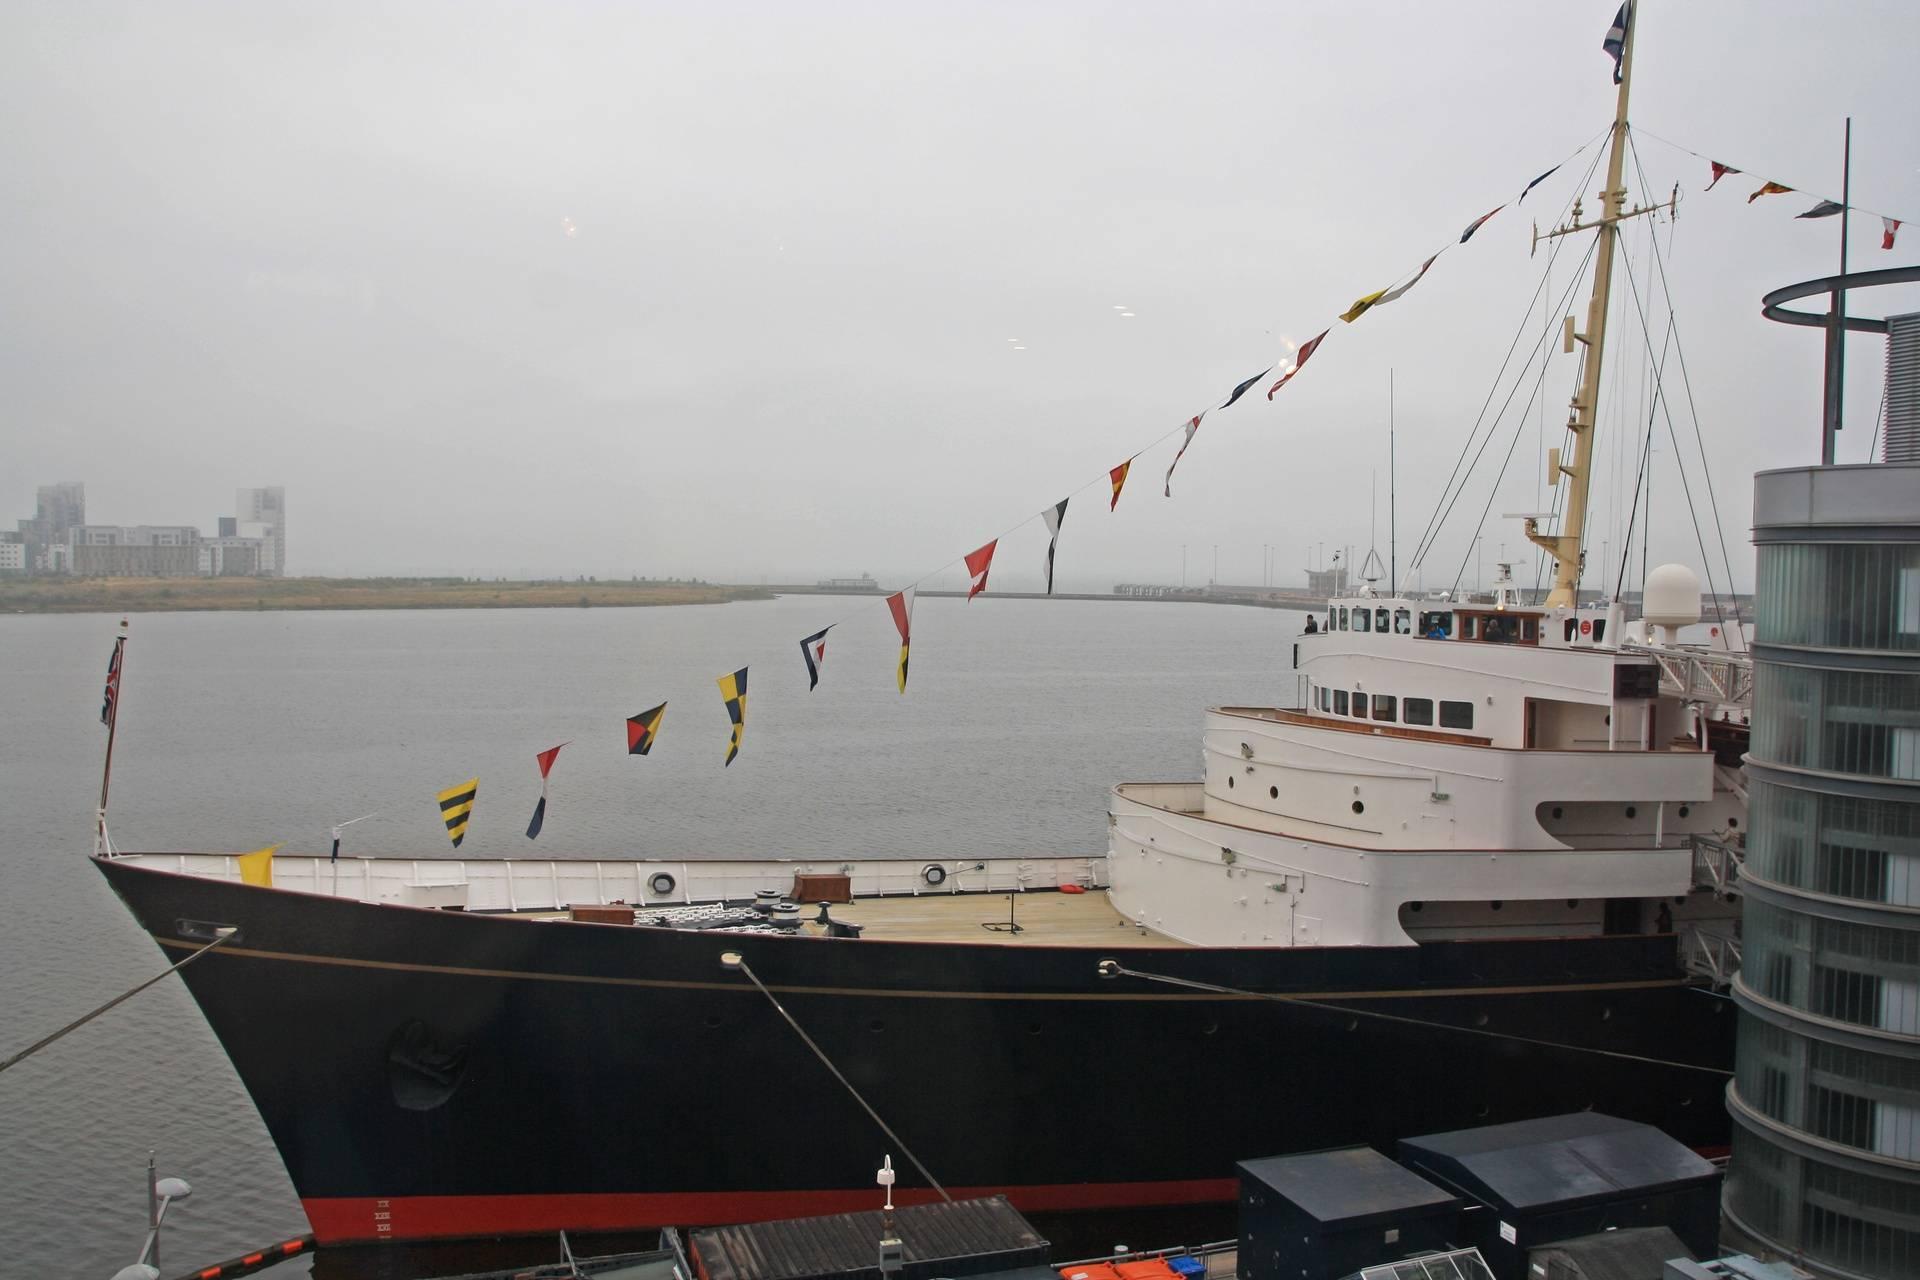 Royal Yacht Britannica